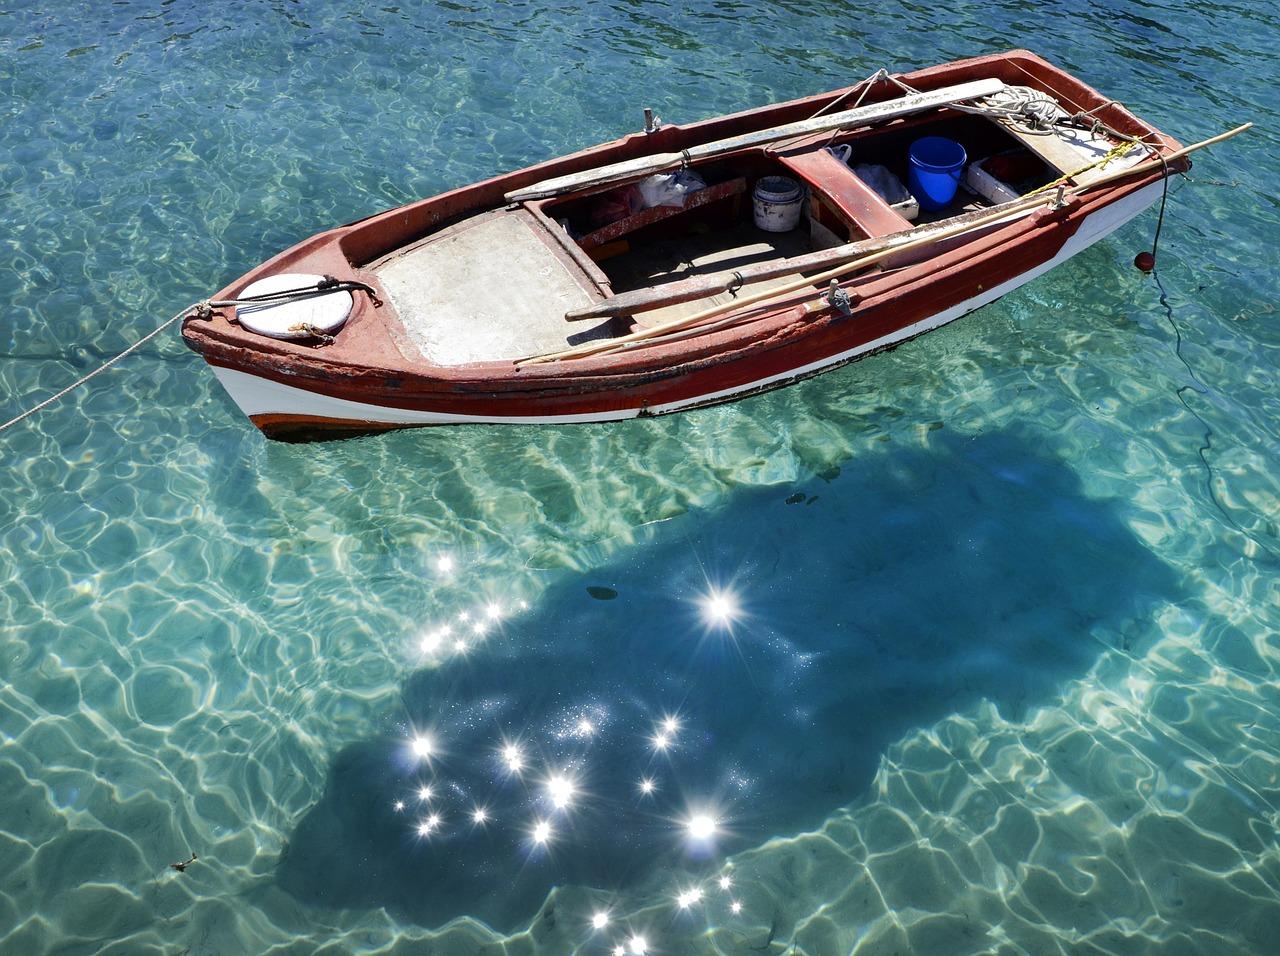 всей фото лодок на прозрачной воде фото позволяют приблизиться